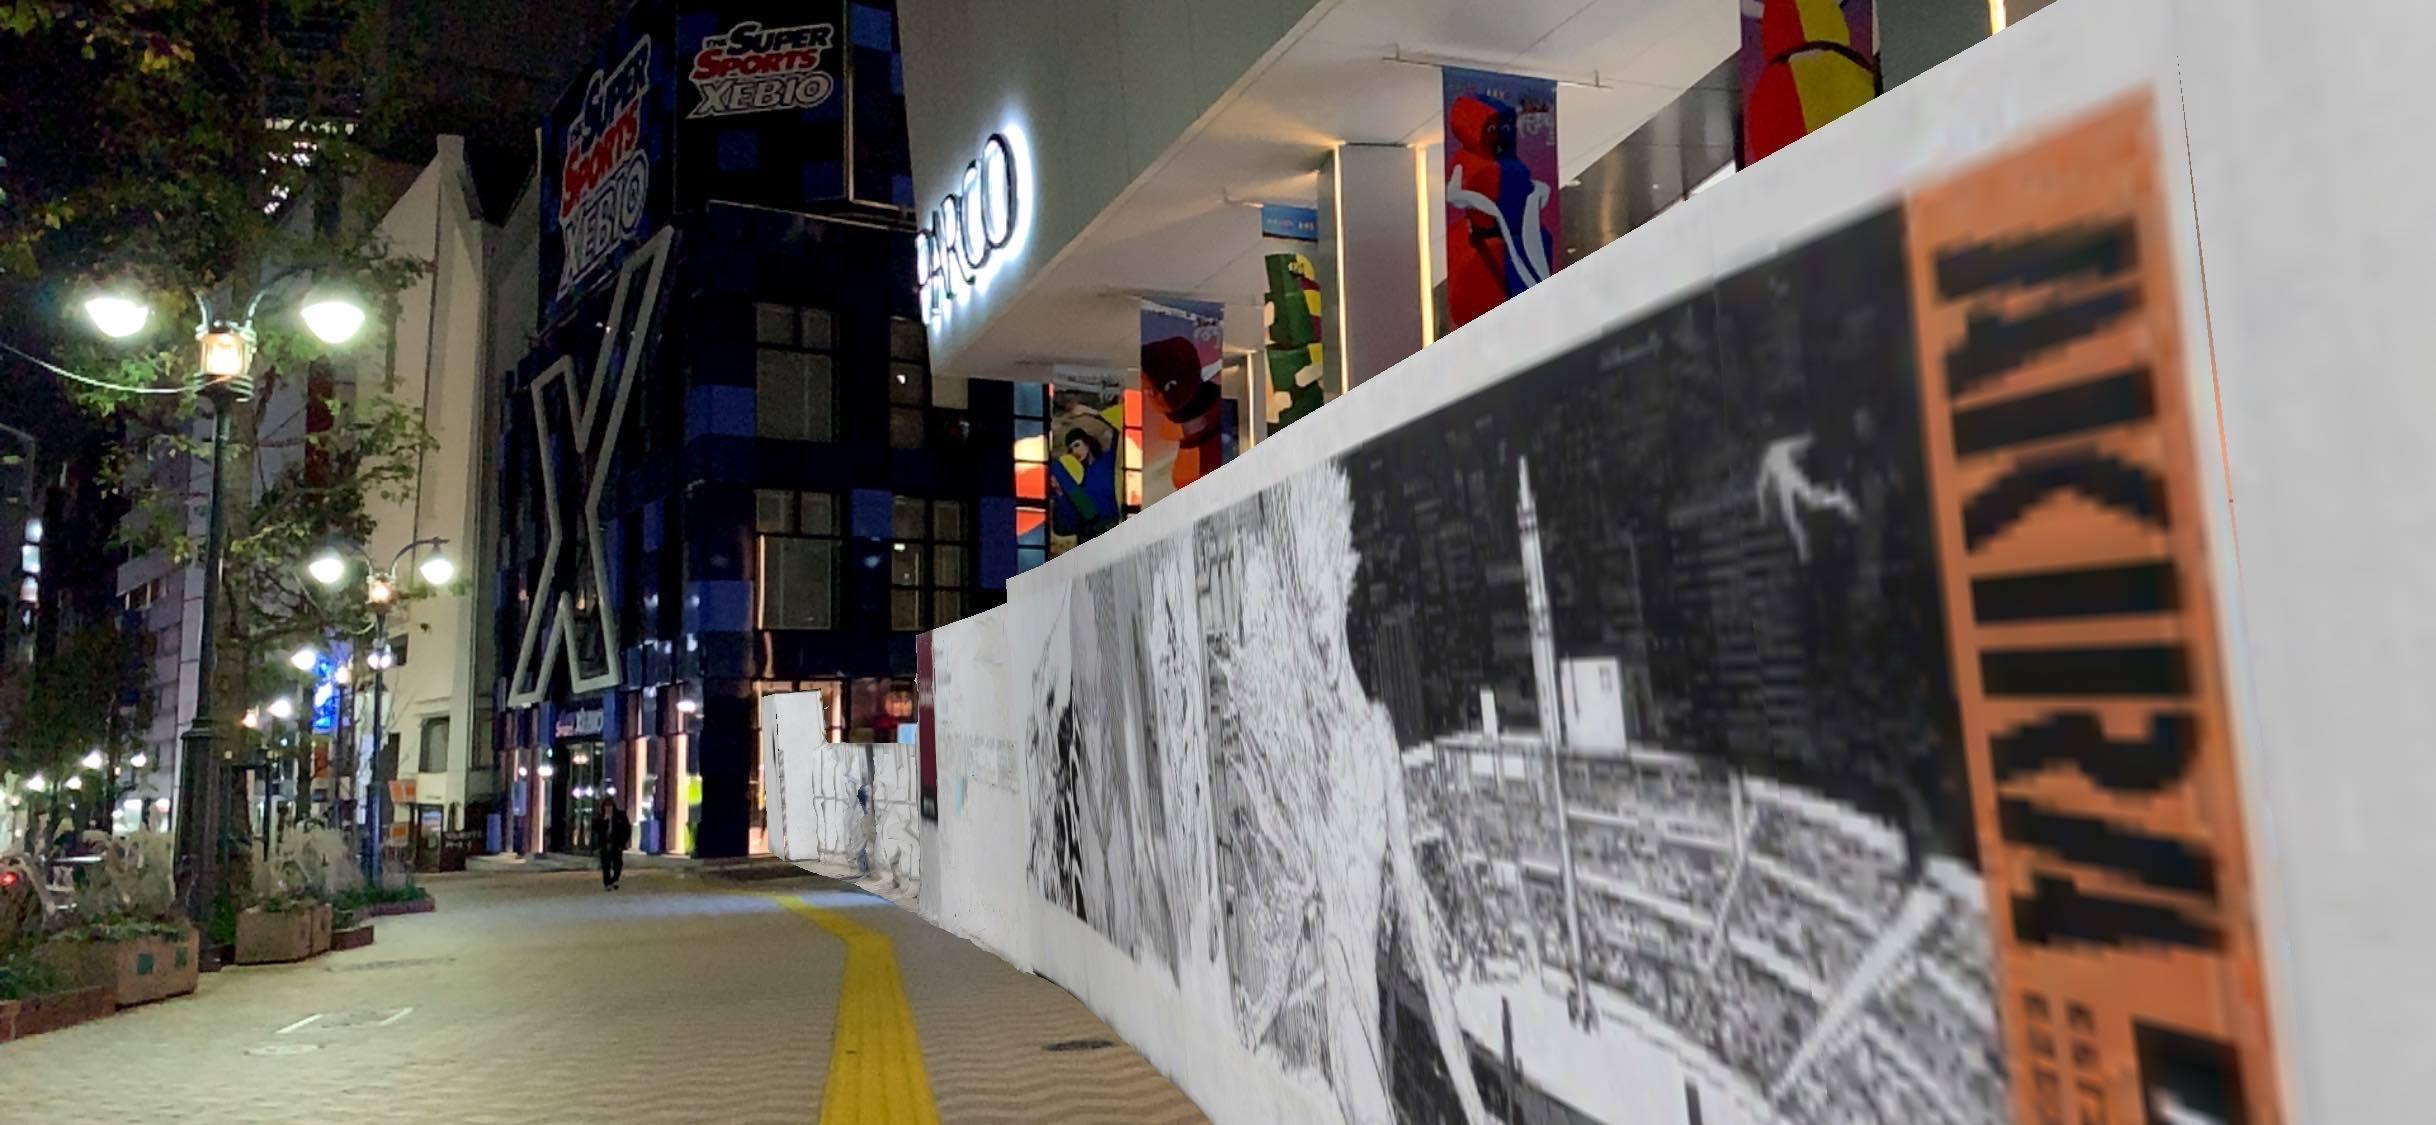 『AKIRA ART OF WALL - INVISIBLE ART IN PUBLIC -』※AR鑑賞イメージ (C)MASH・ROOM/KODANSHA (C)Kosuke Kawamura (C)︎AKIRA ART OF WALL EXHIBITION